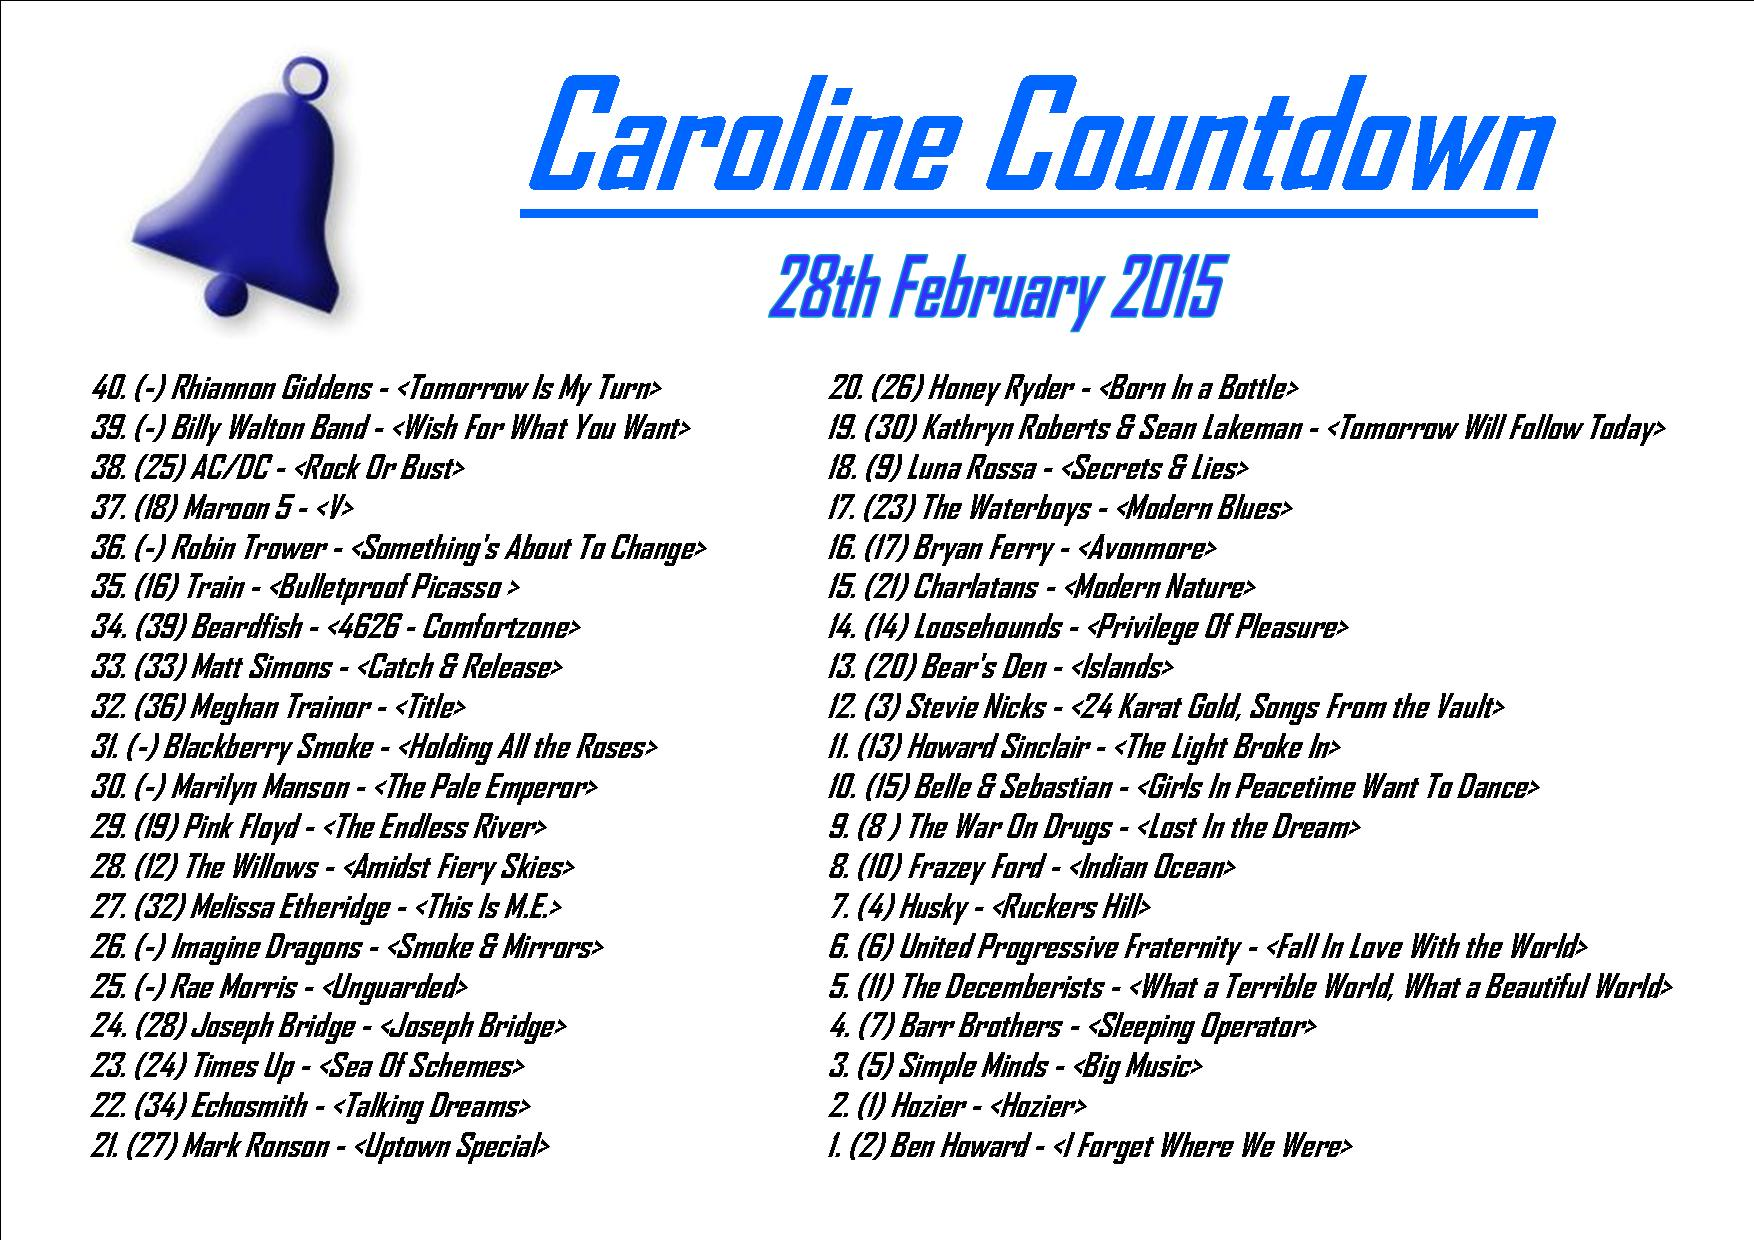 caroline countdown 2 28.2.15